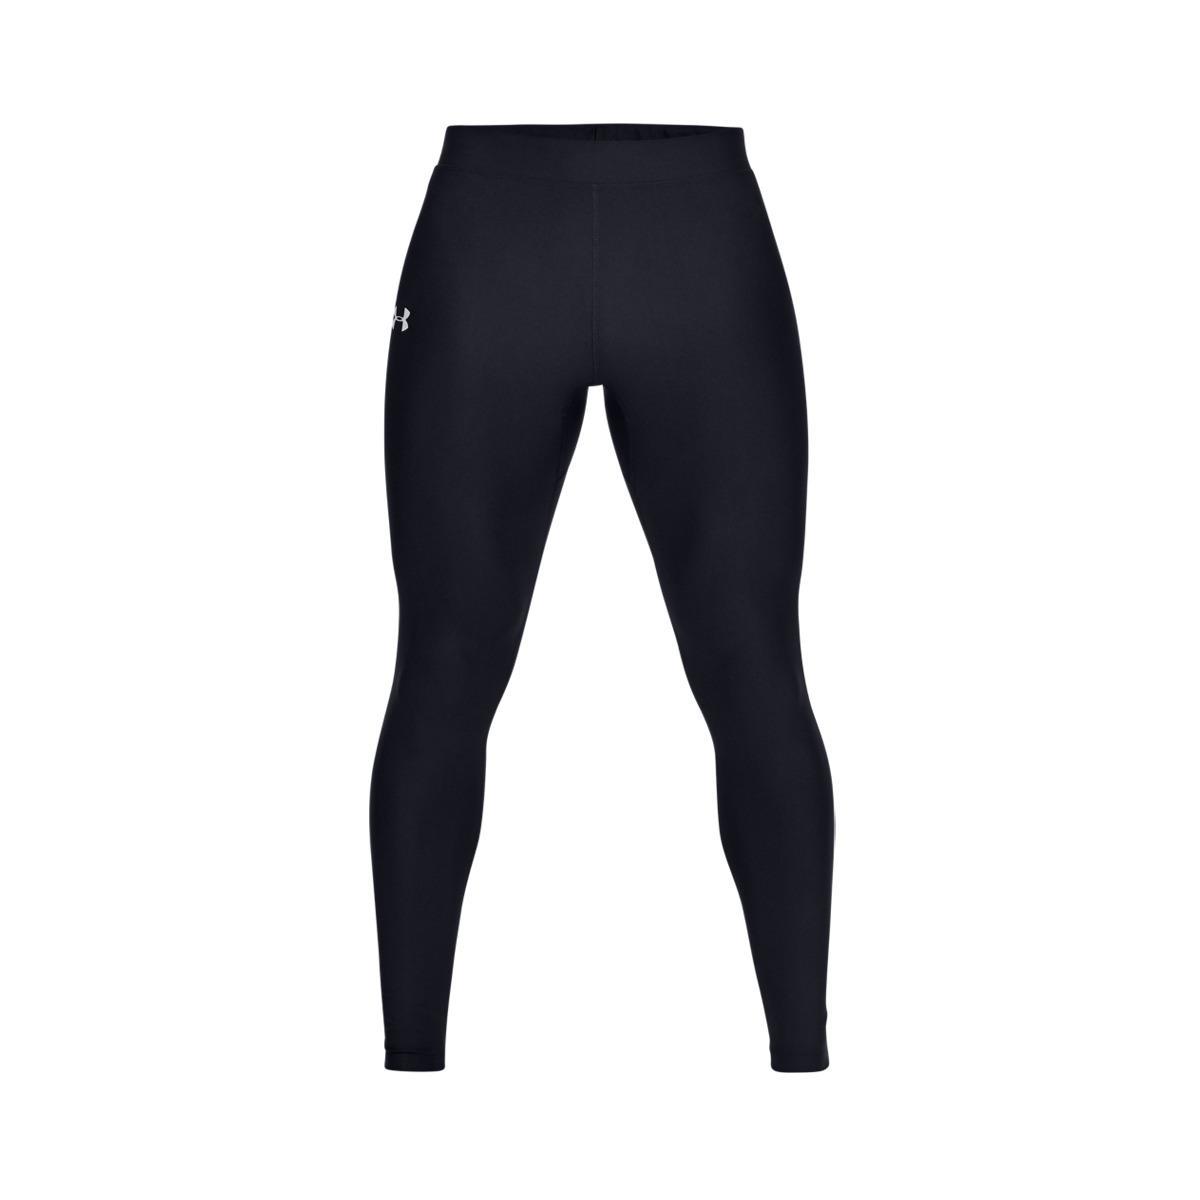 8056e646fc Lyst - Under Armour Qualifier Heatgear leggings in Black for Men